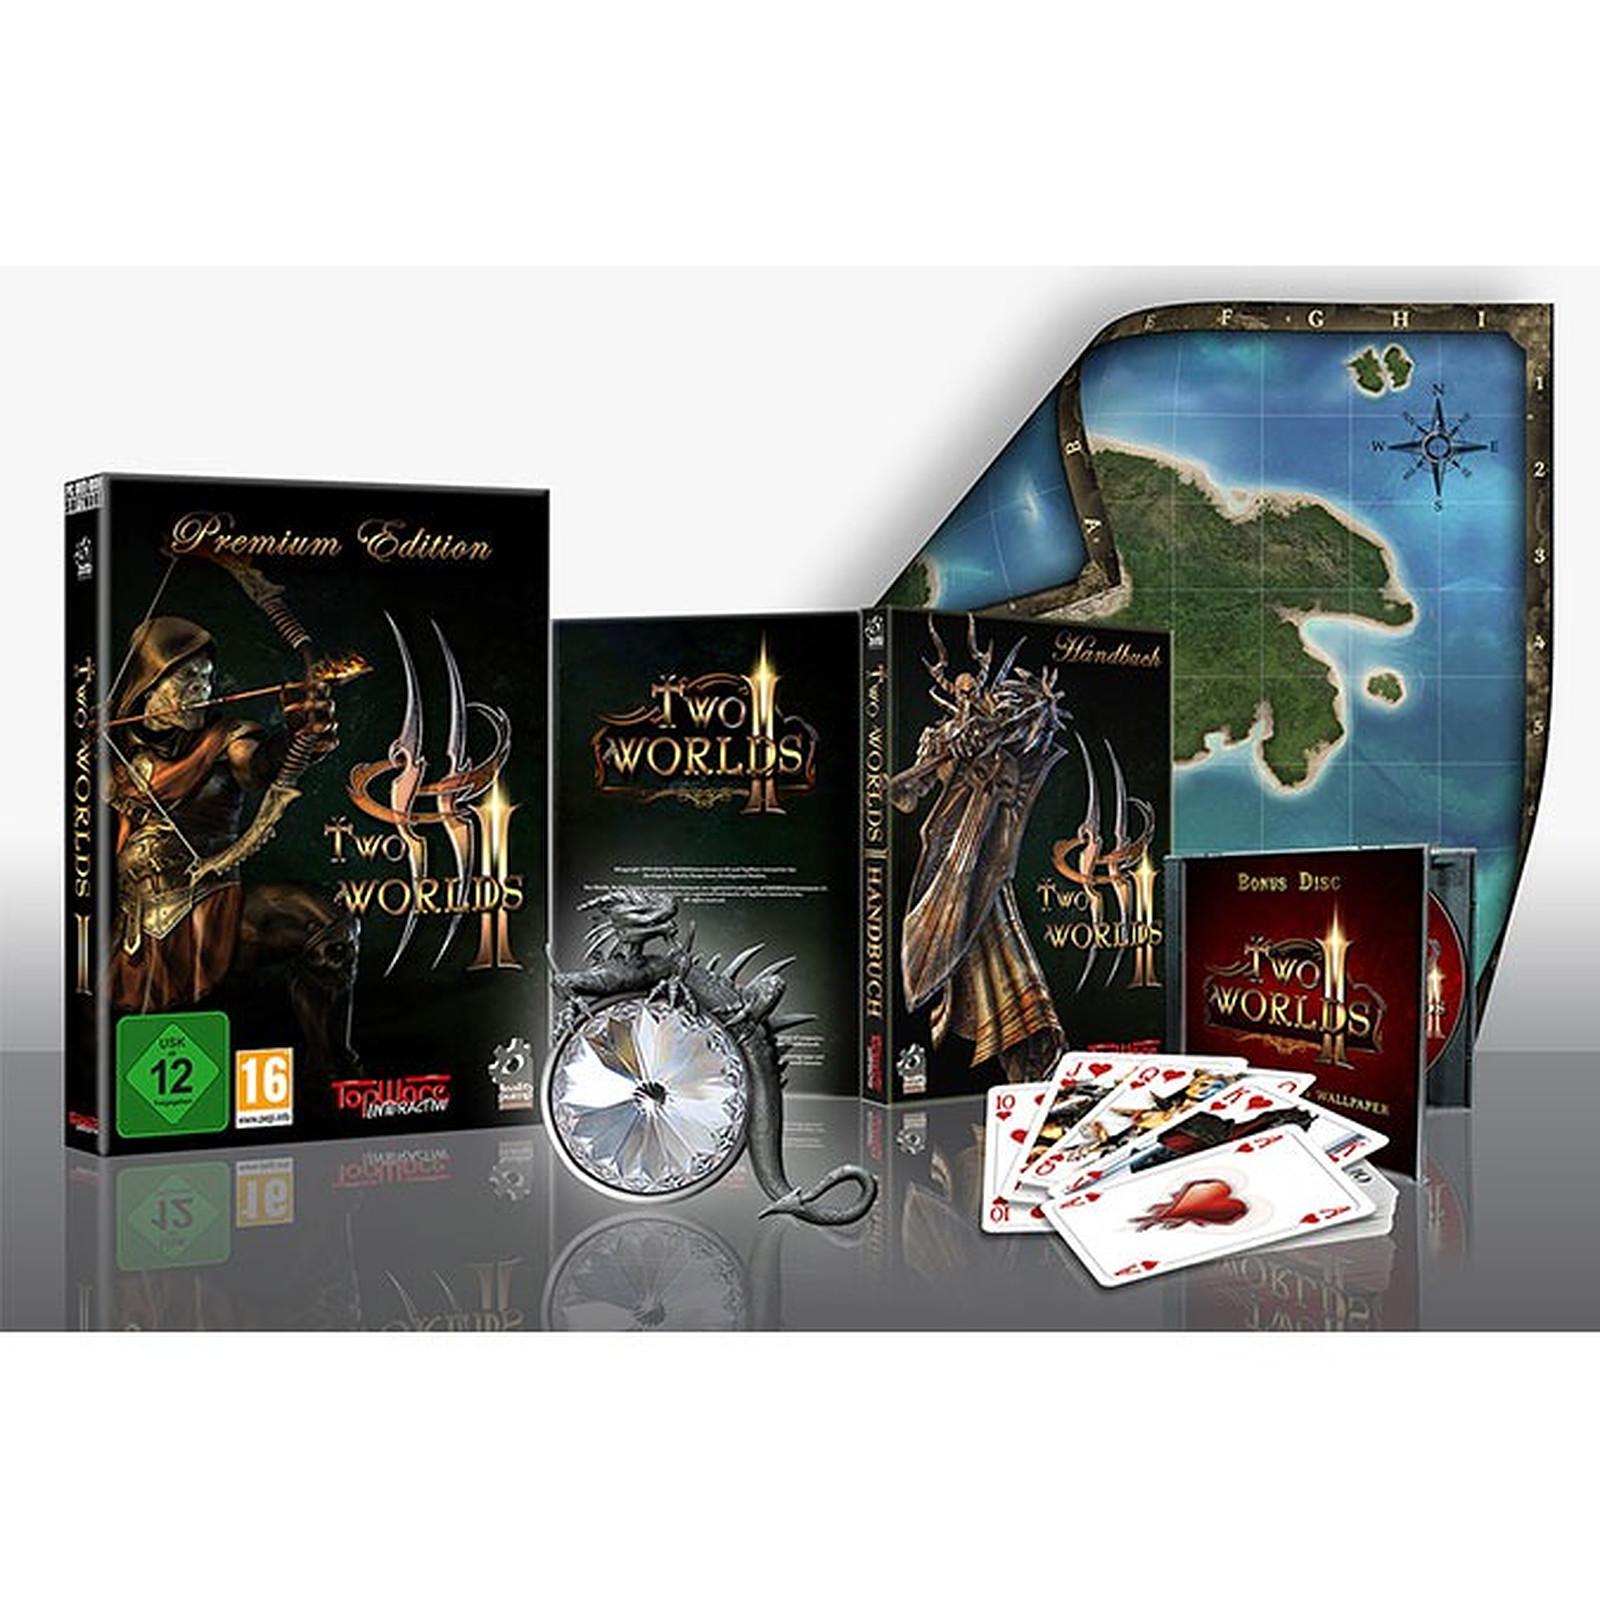 Two Worlds II - Premium Edition (PC/Mac)